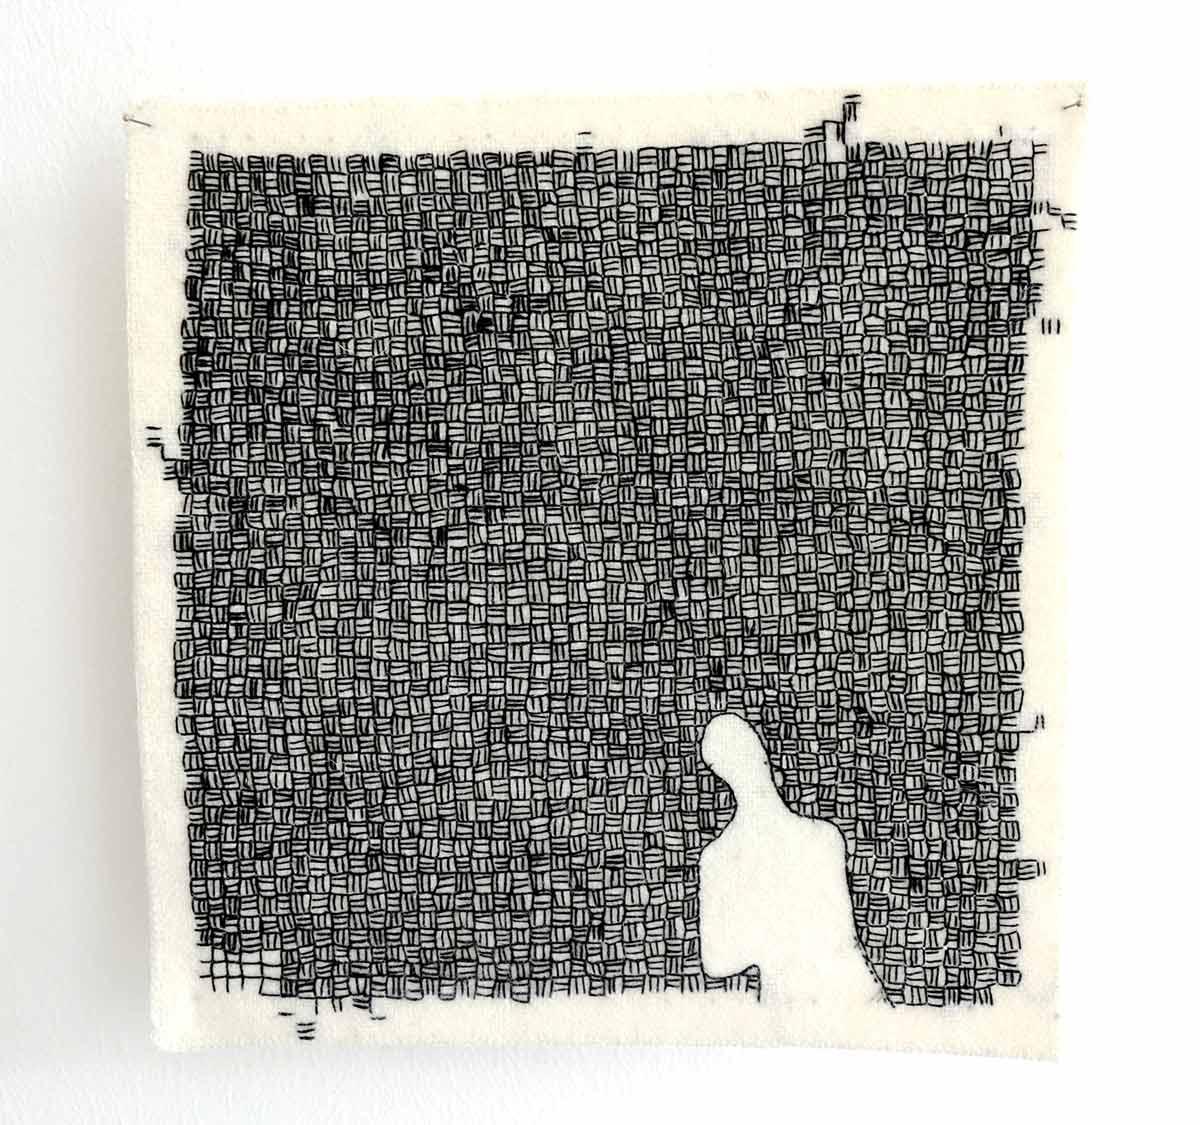 FIVE O'CLOCK SHADOW | Hand embroidered, cotton on wool,19cms x 19cms. Photo: Yeshen Venema.